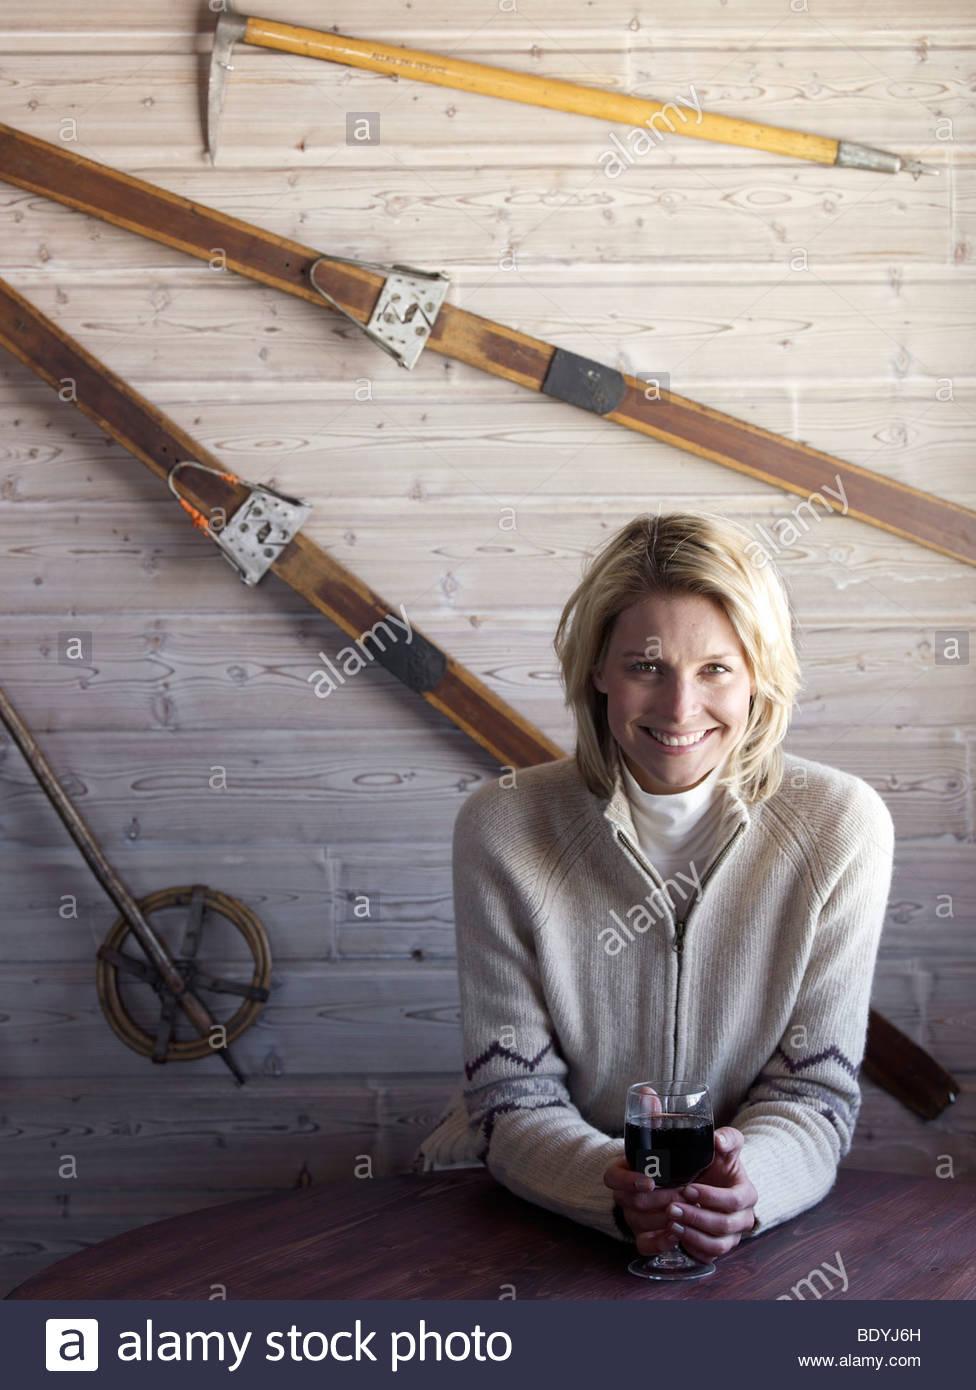 woman sitting at ski lodge table - Stock Image